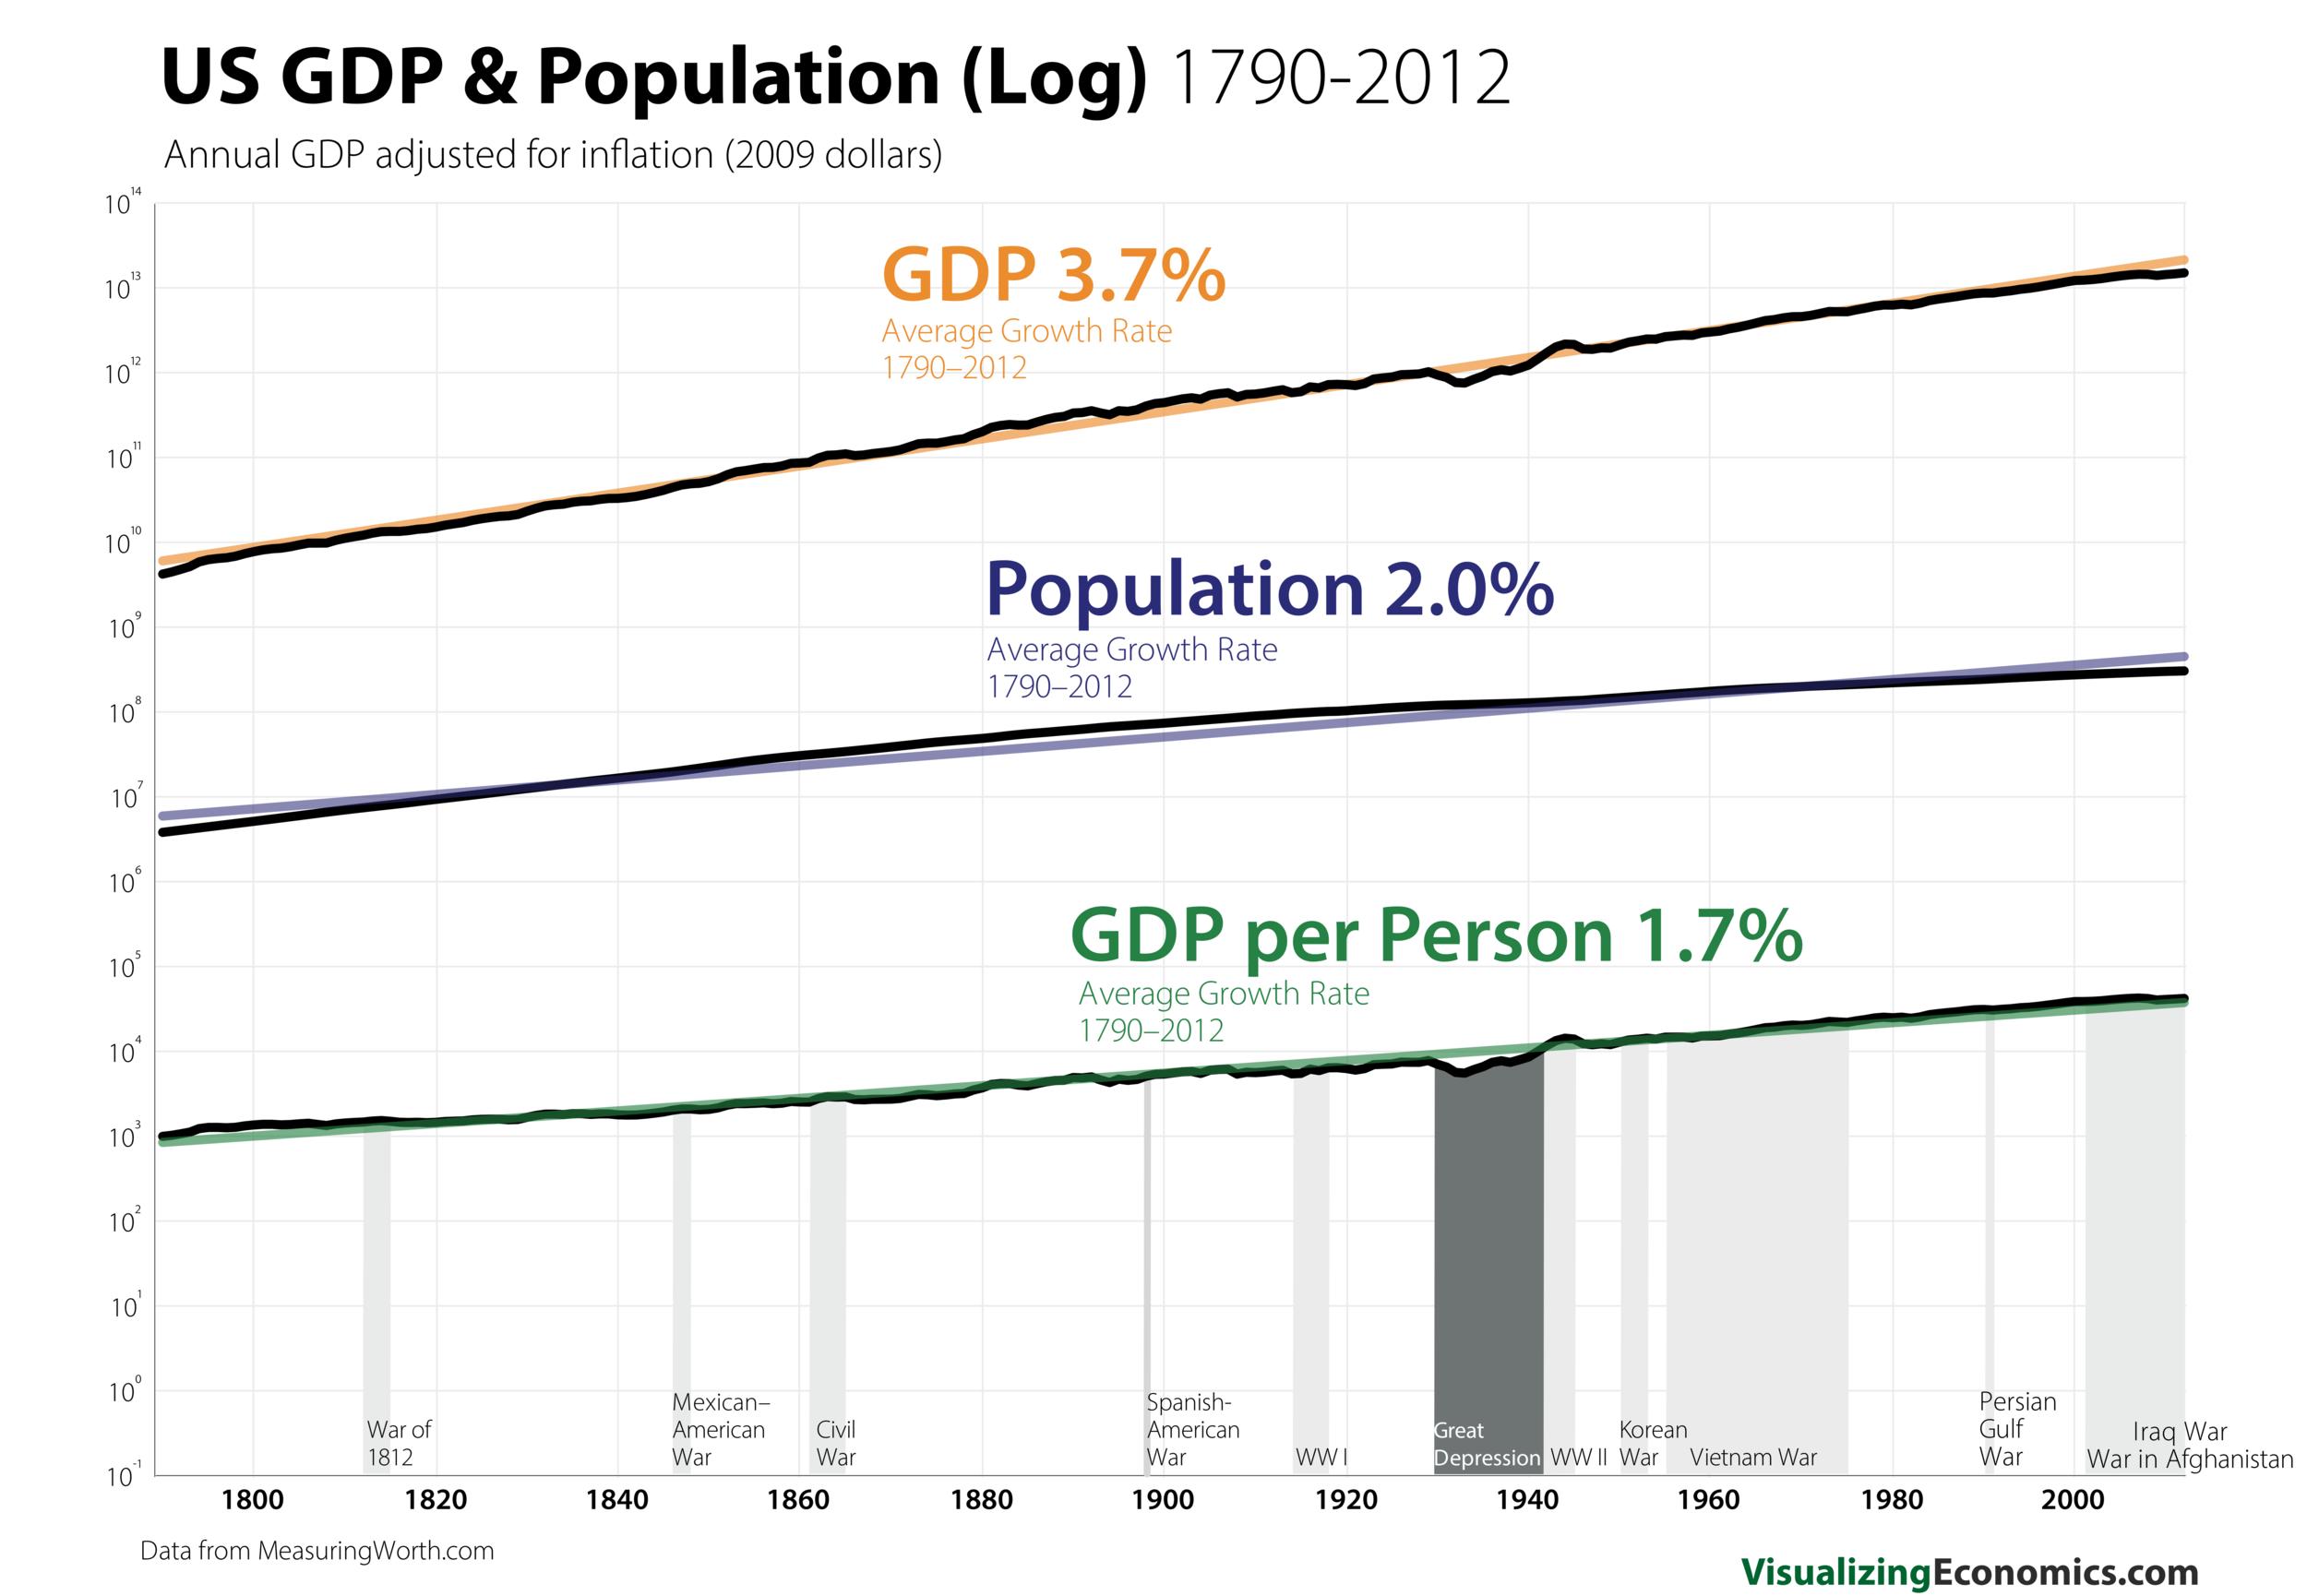 US Pop_GDP 1790 Log_8.png